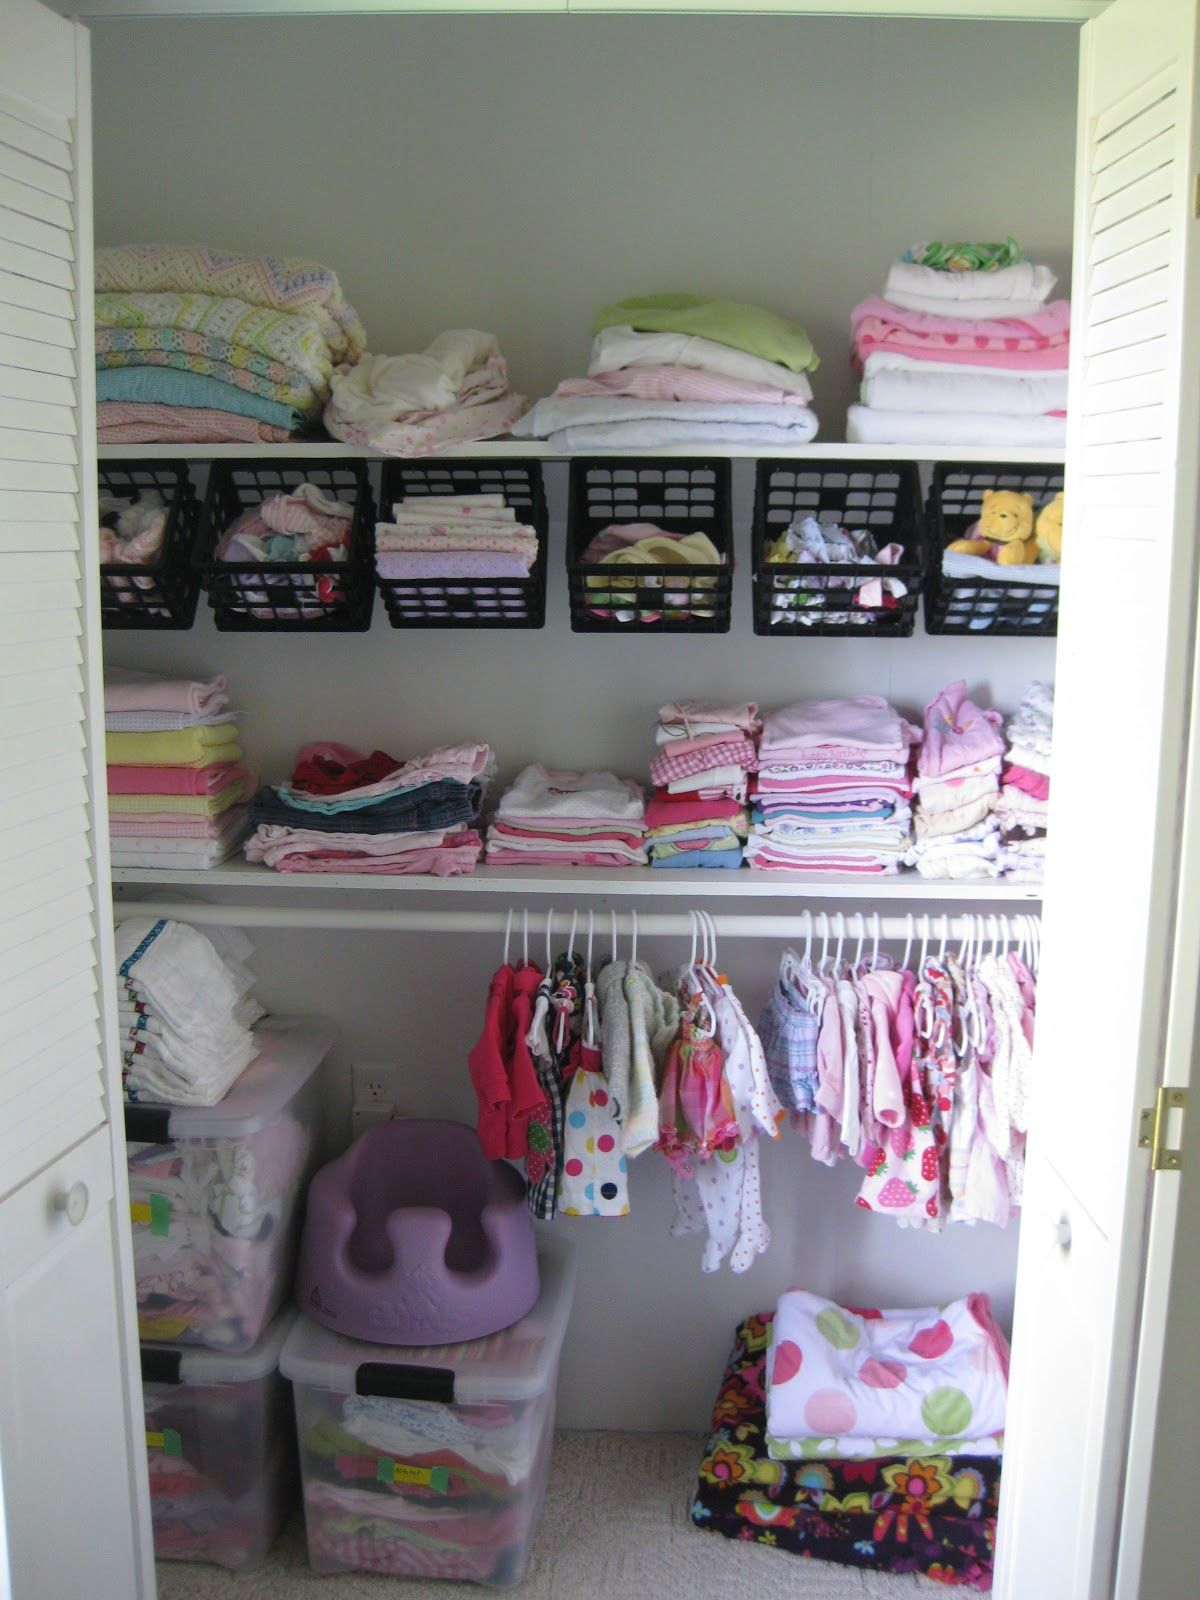 Dollar Tree Crates Hung Under A Shelf! Genius!   Baby Closet, Nursery Closet Organization, Baby Closet Organization